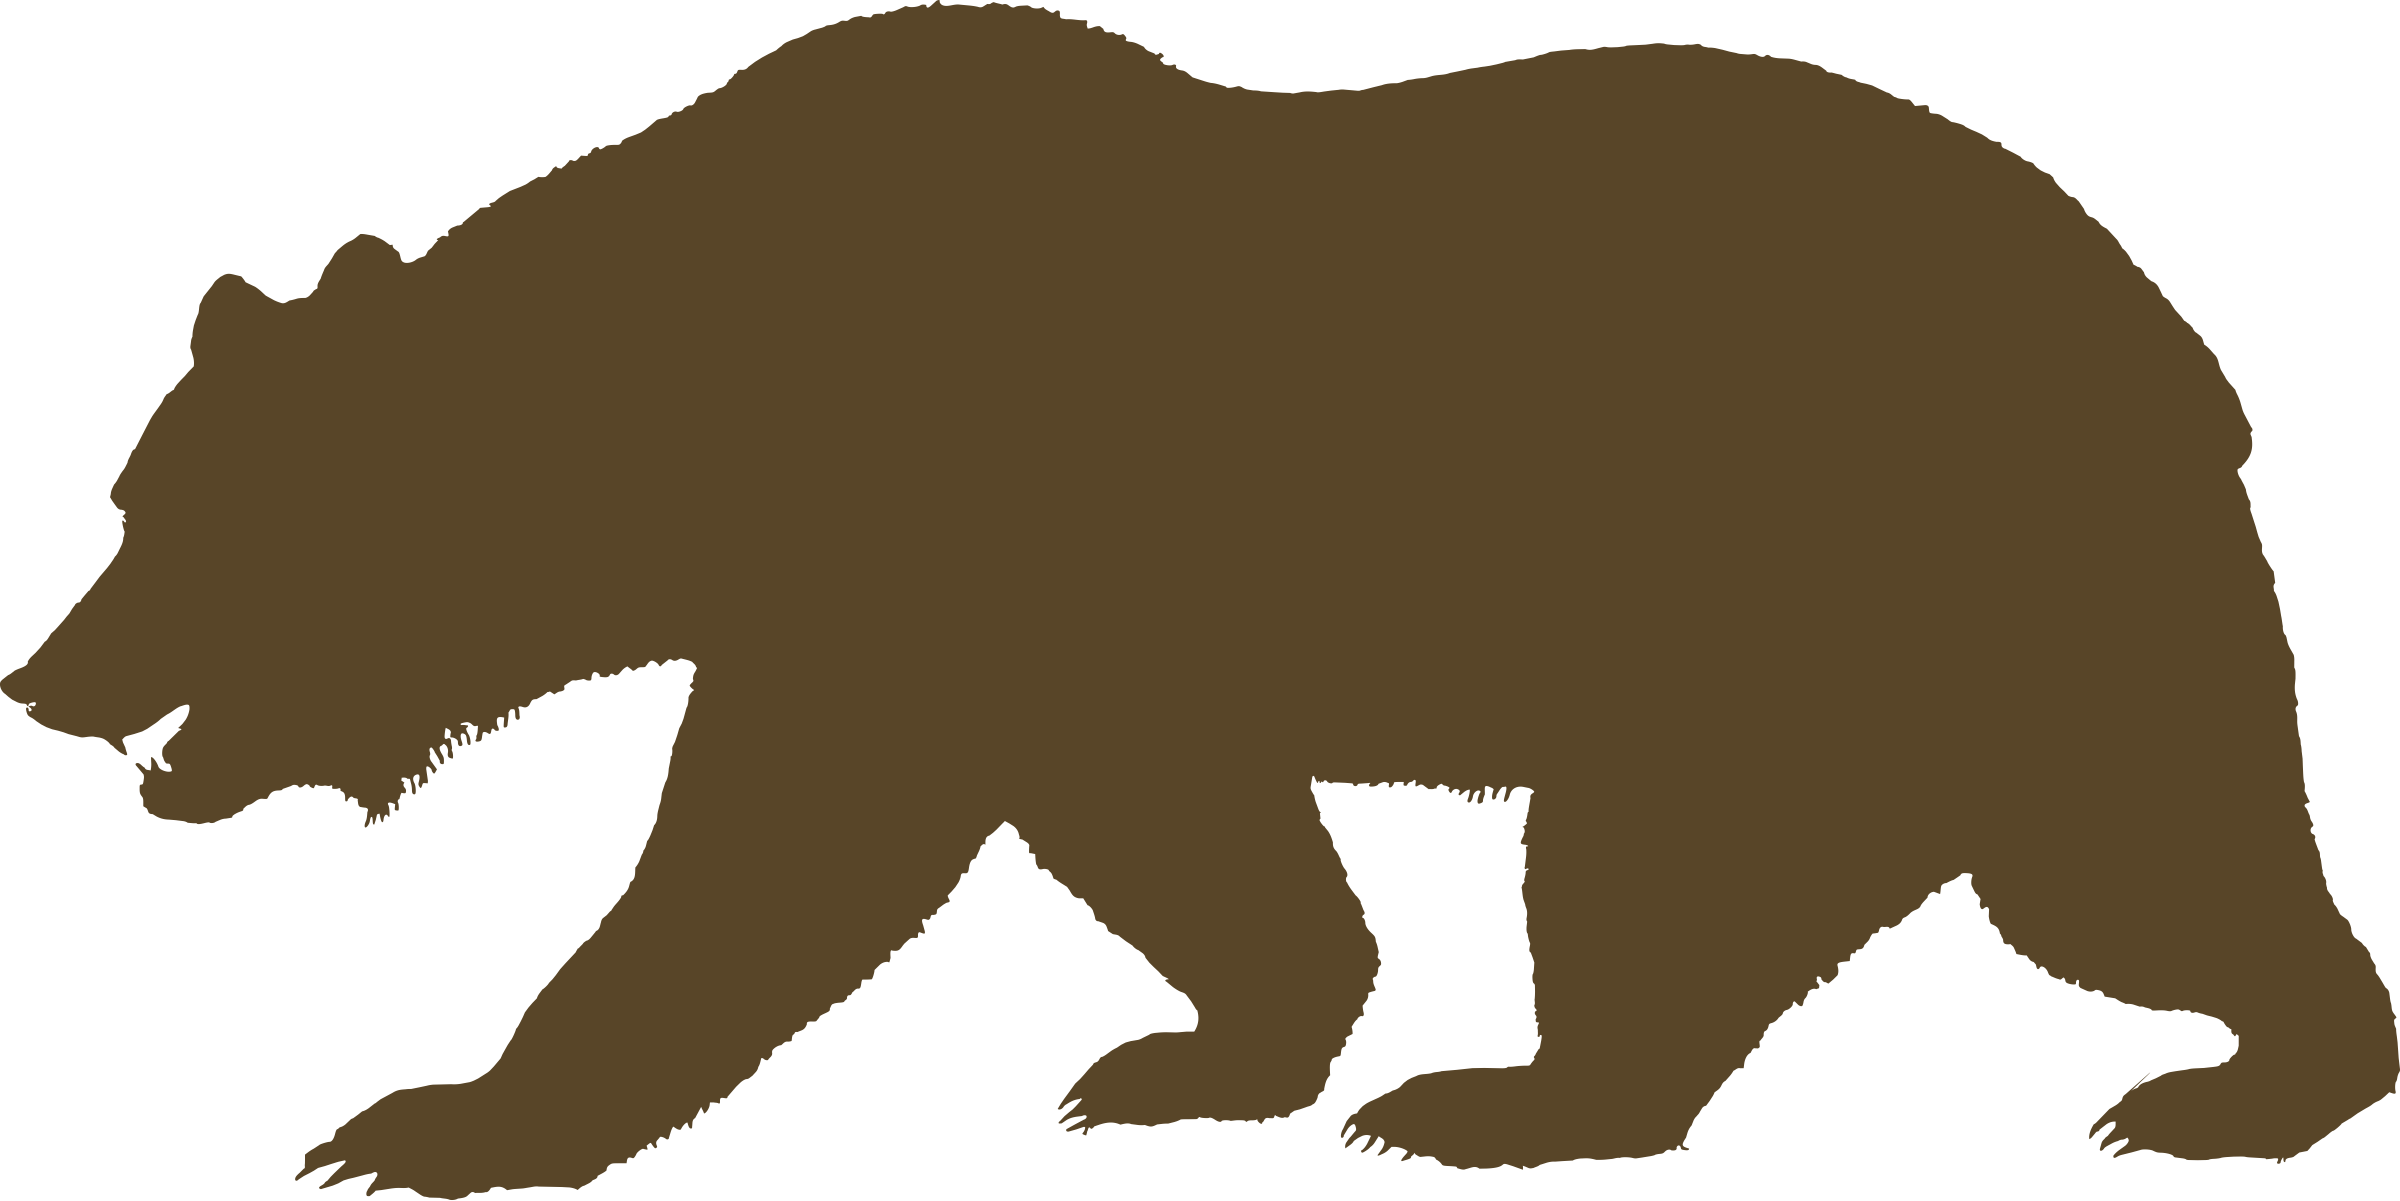 California Bear Google Search Bear Silhouette Animal Silhouette California Bear